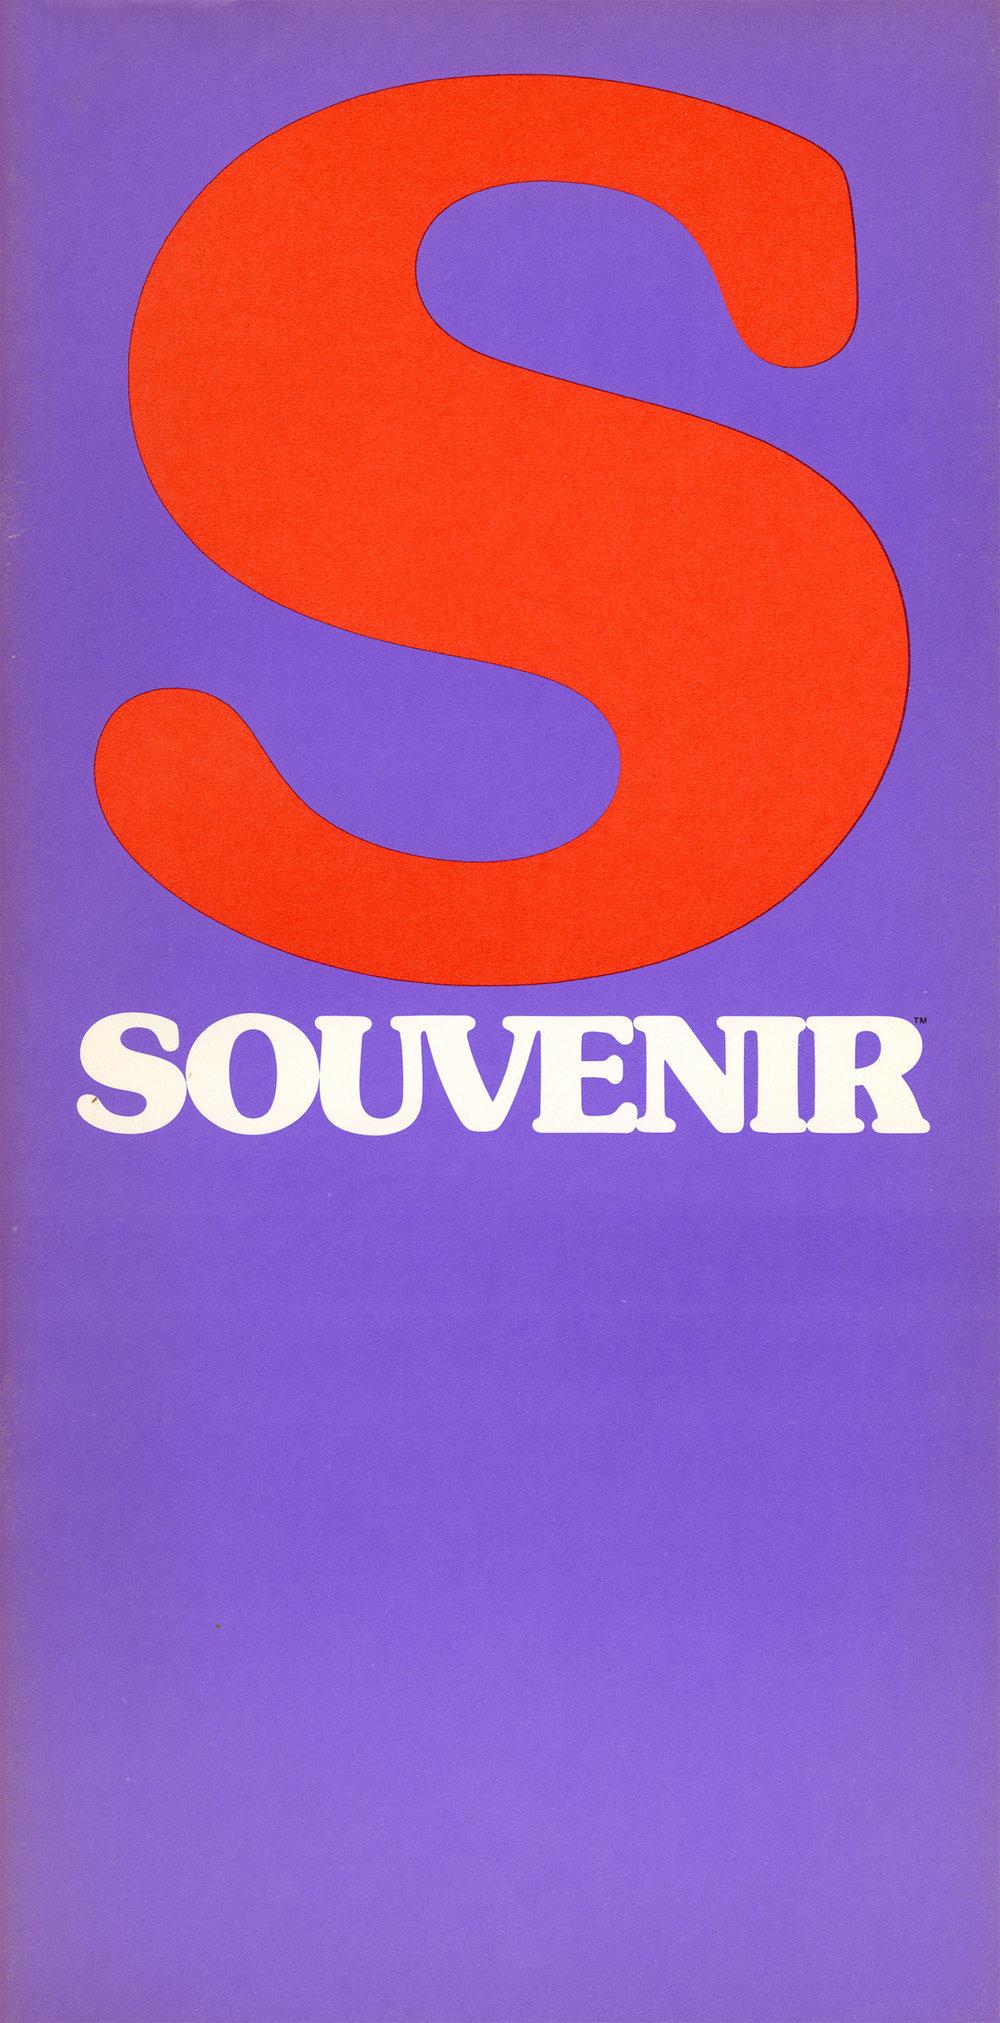 itc-souvenir-cover.jpg